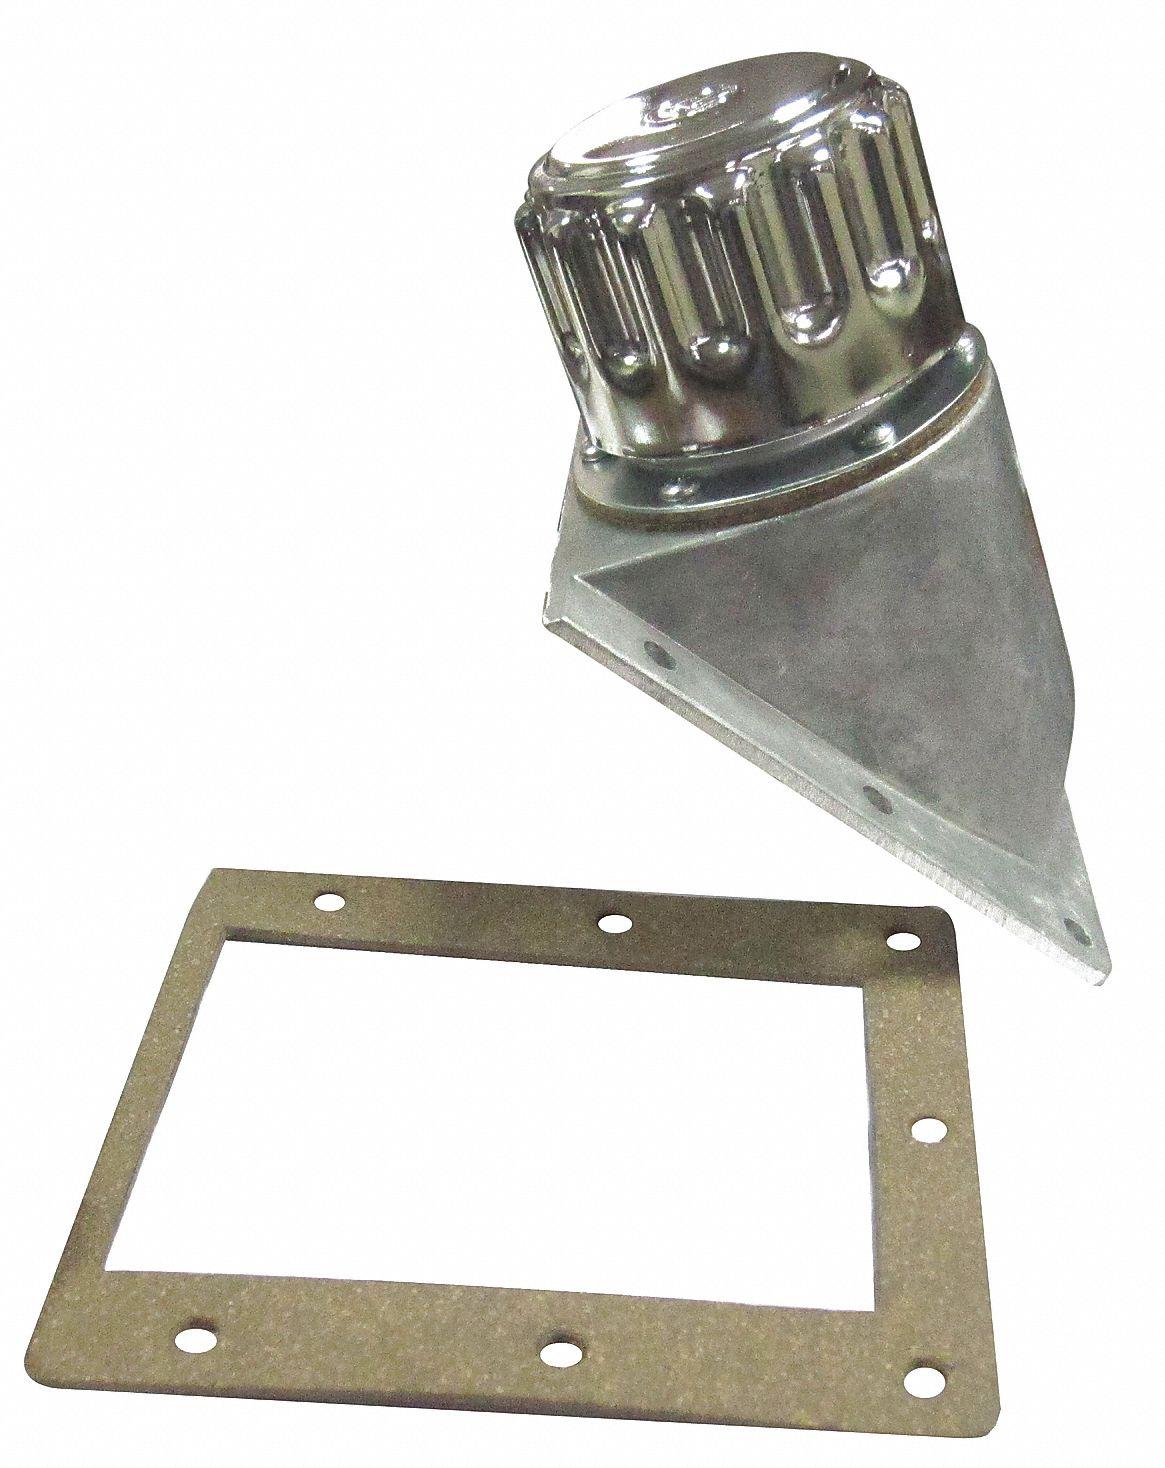 Reservoir Filler Breather, 6 1 Body Length (In ), Nickel-Chrome-Plated  Steel Cap Material